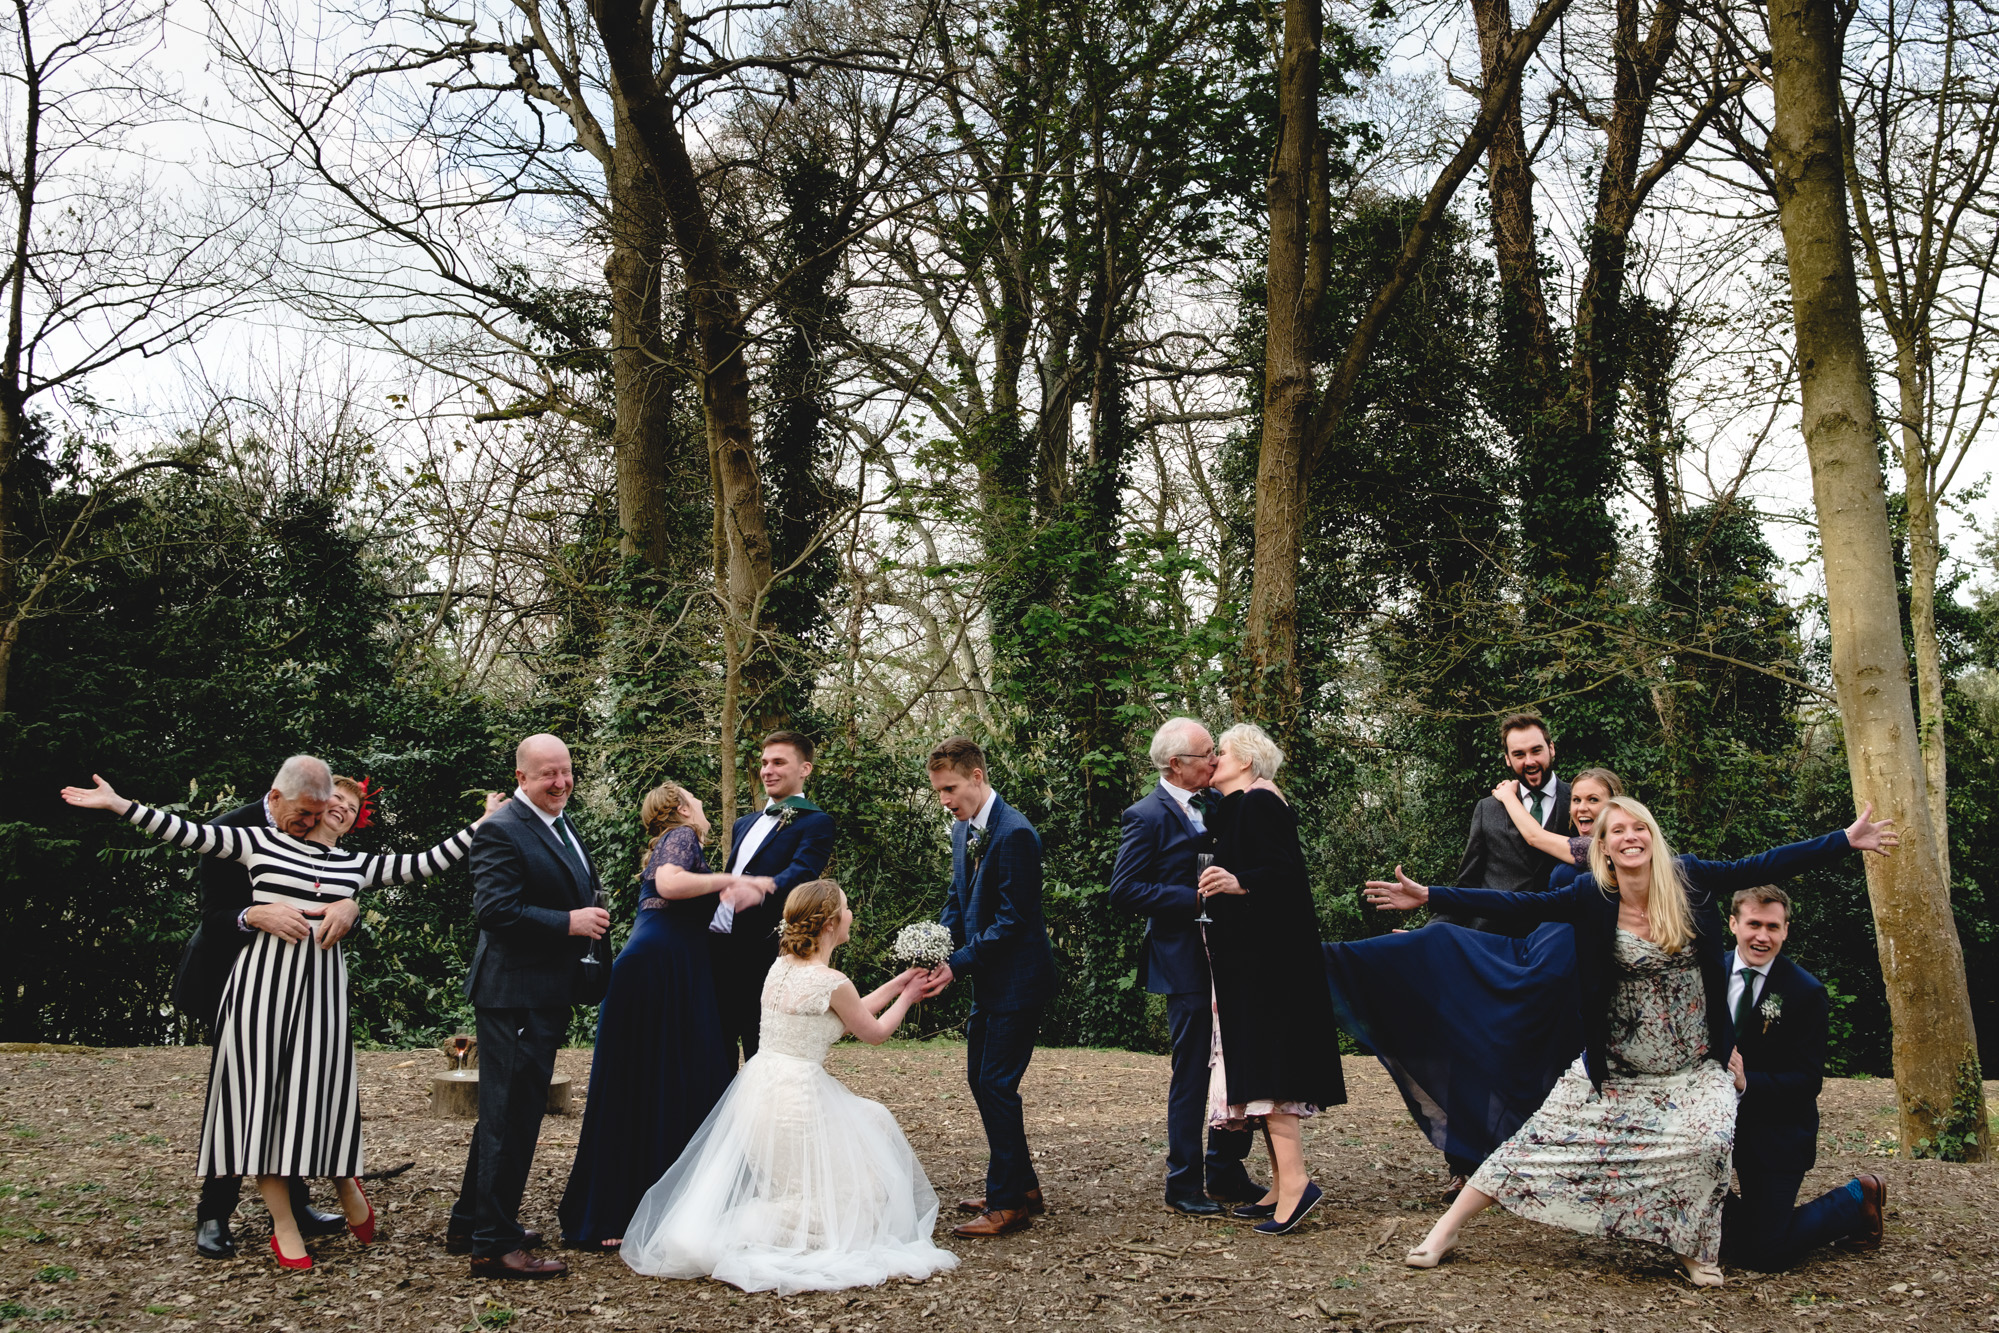 Katie and Dode weddings (121 of 207).jpg